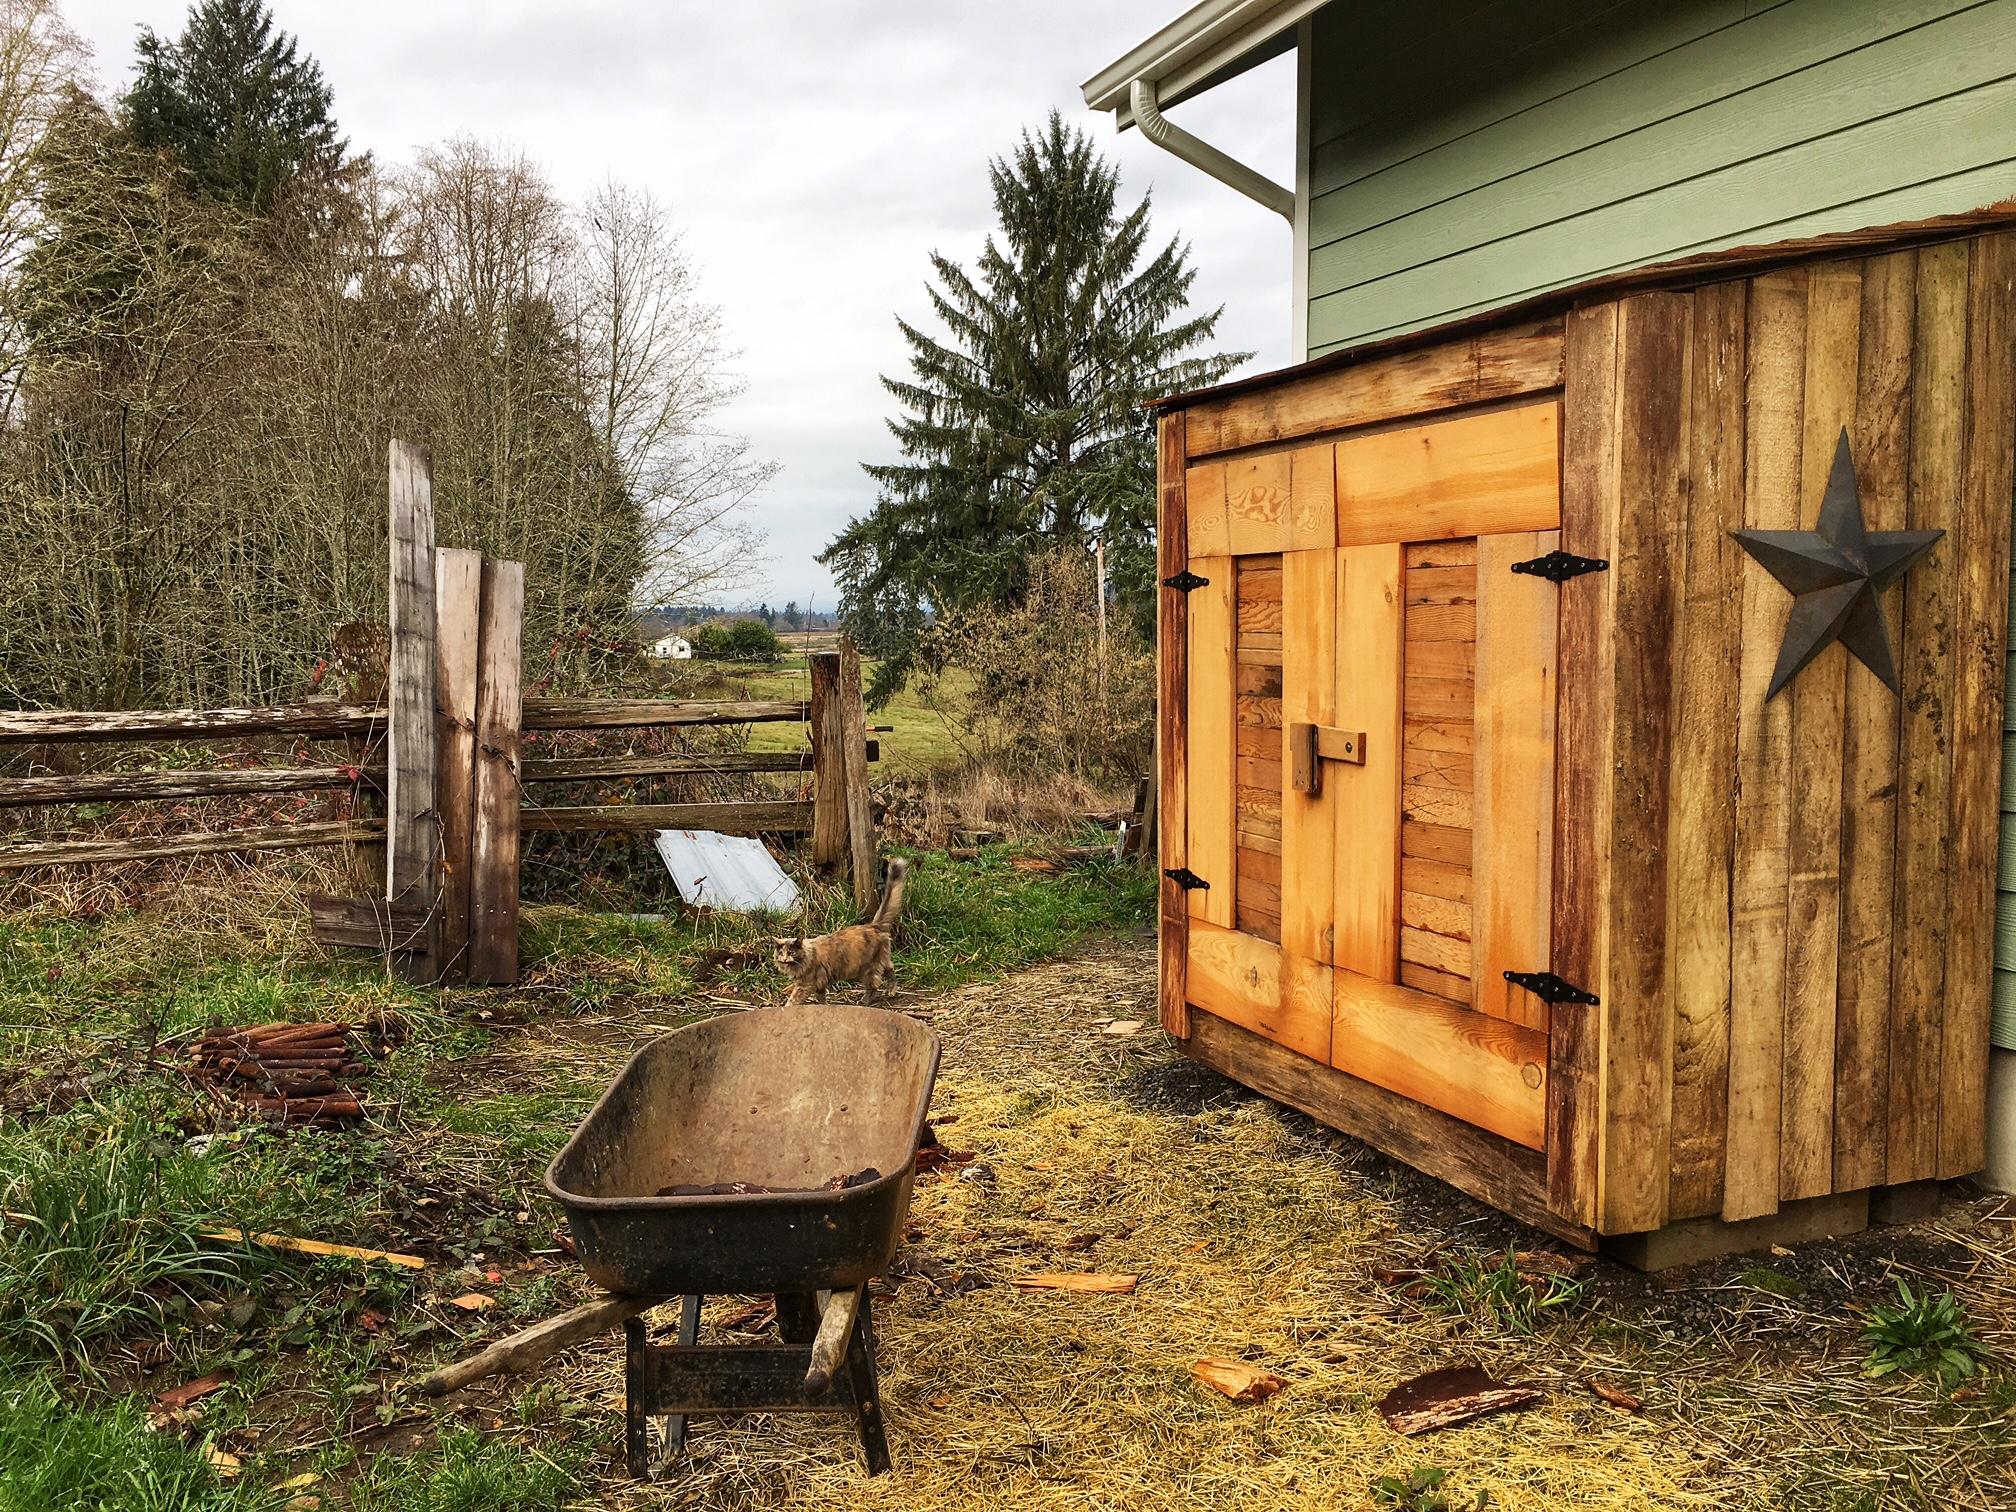 The woodshed that Jasper built